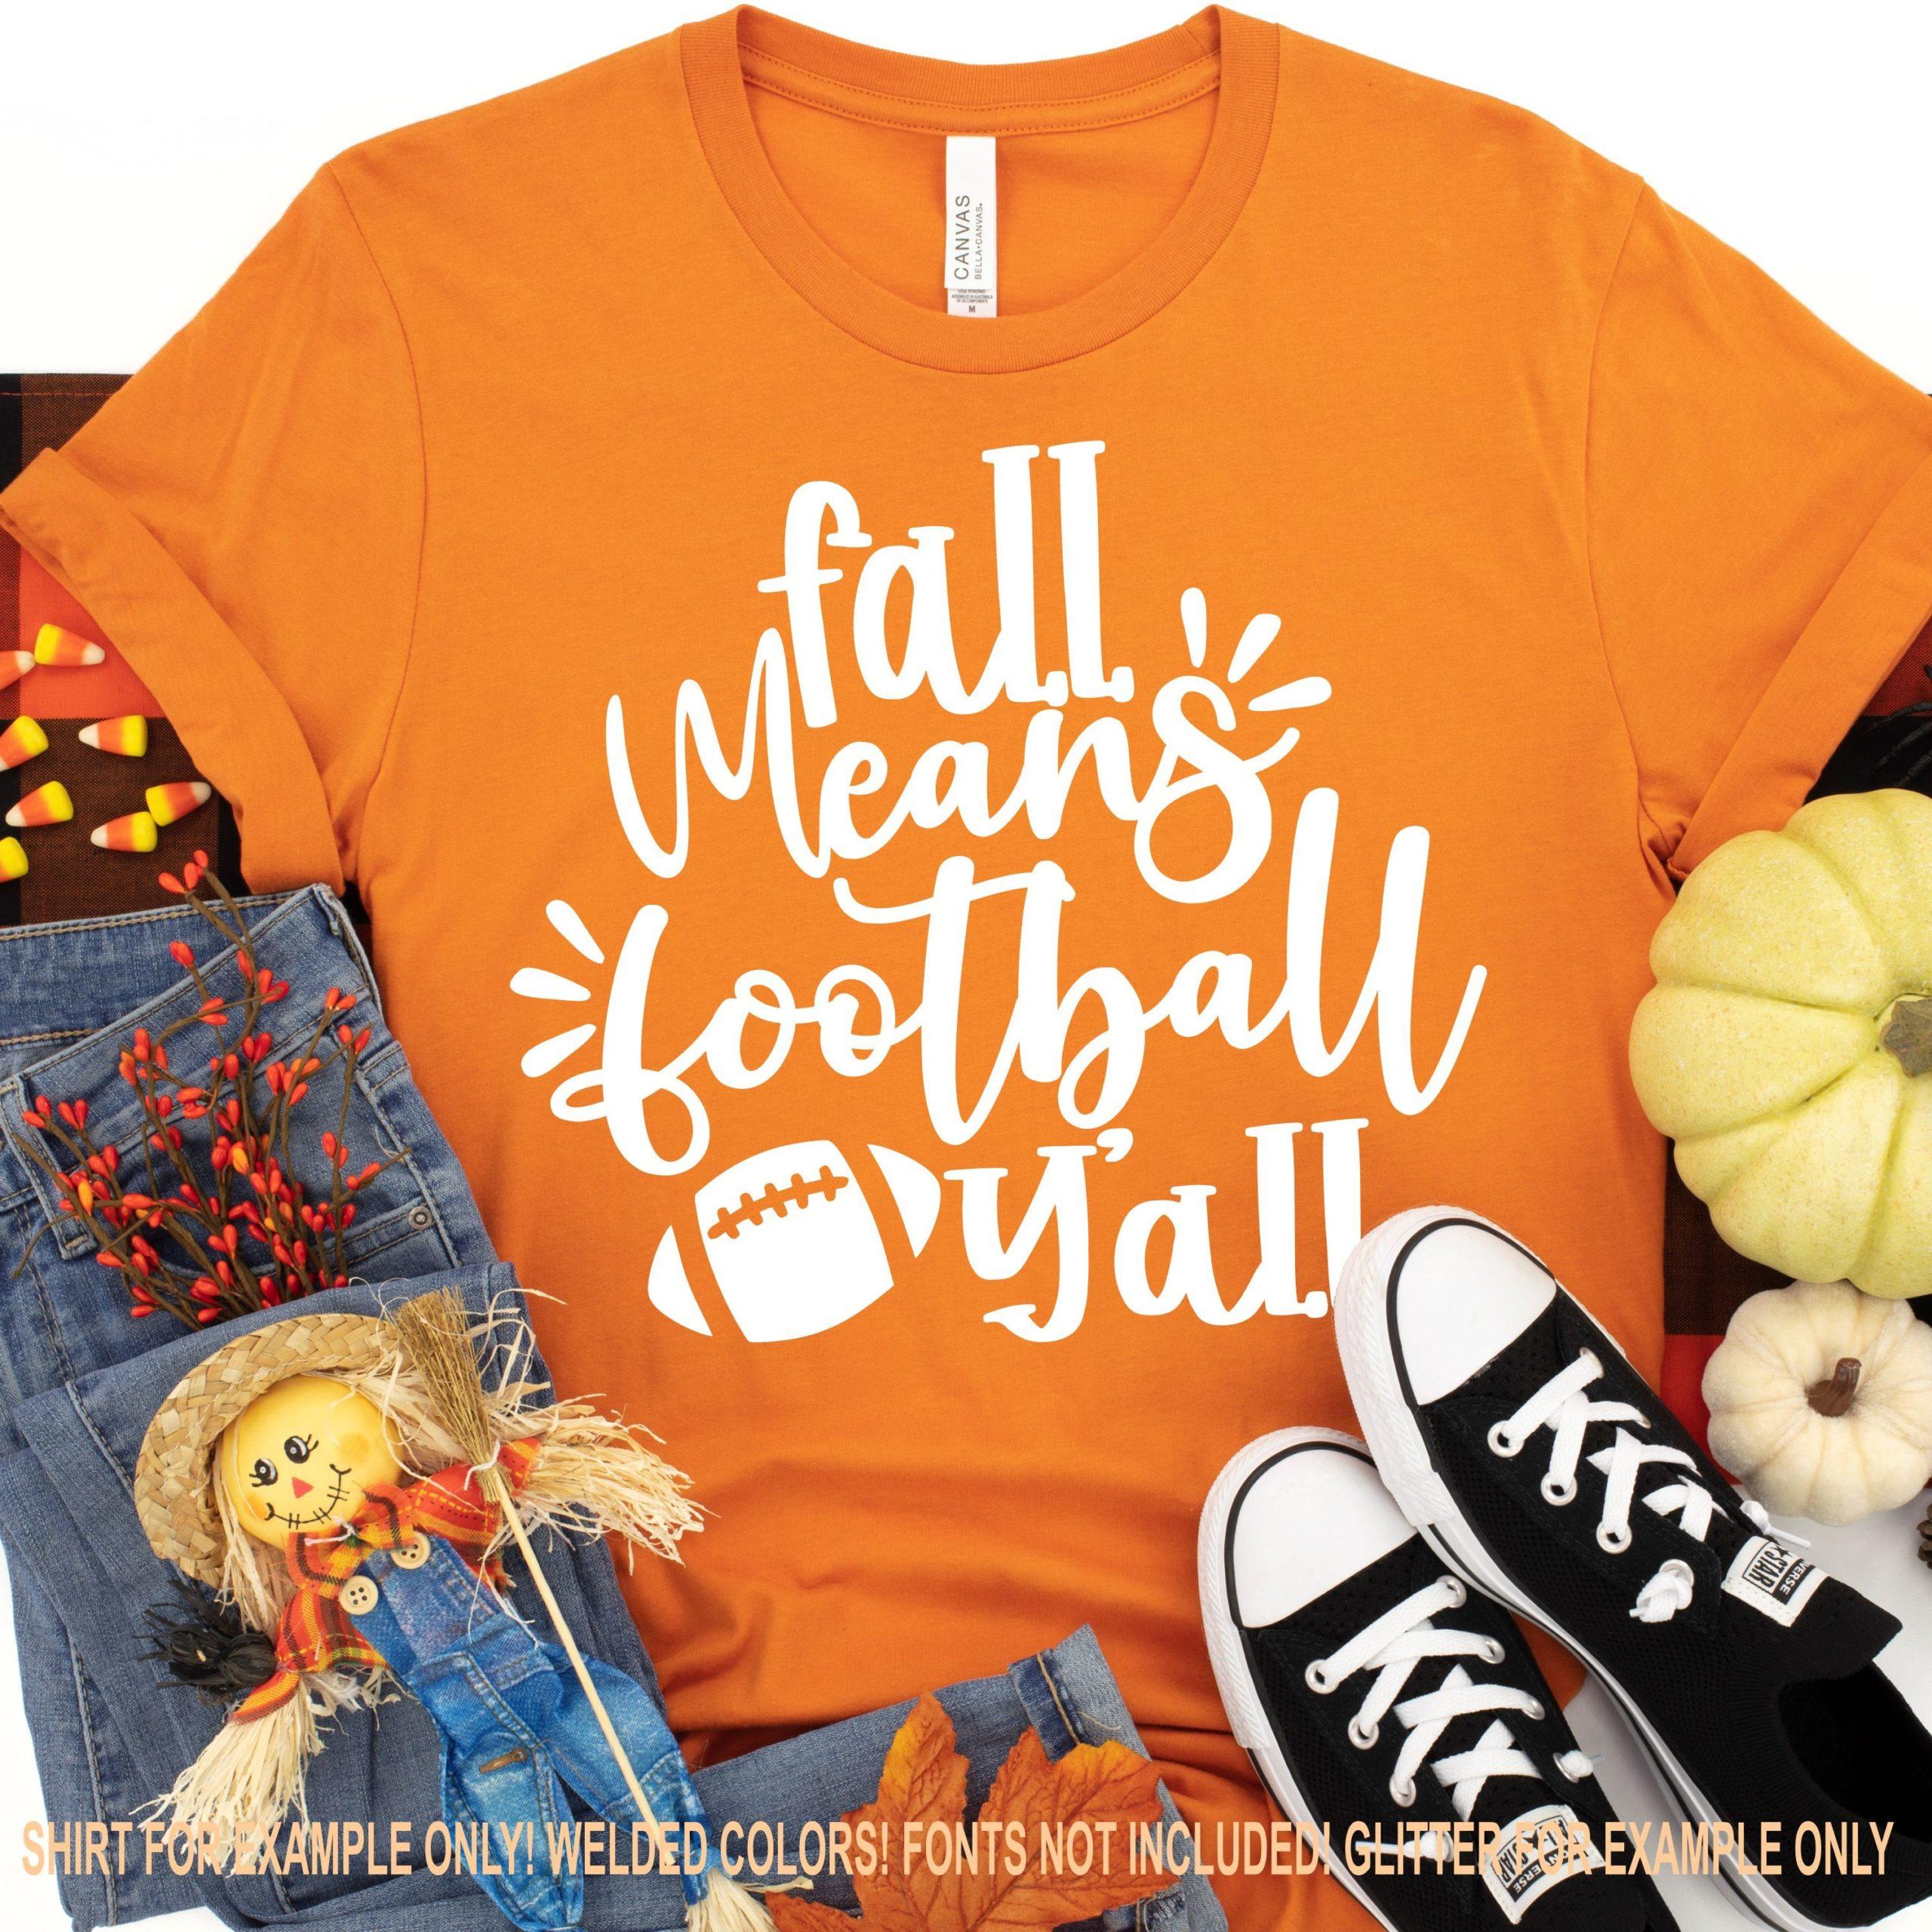 Fall-means-football-svg-football-svg-fall-svg-football-season-svgthanksgiving-svgfootball-svg-designscricut-svgsvg-for-mobile-5f7219ab